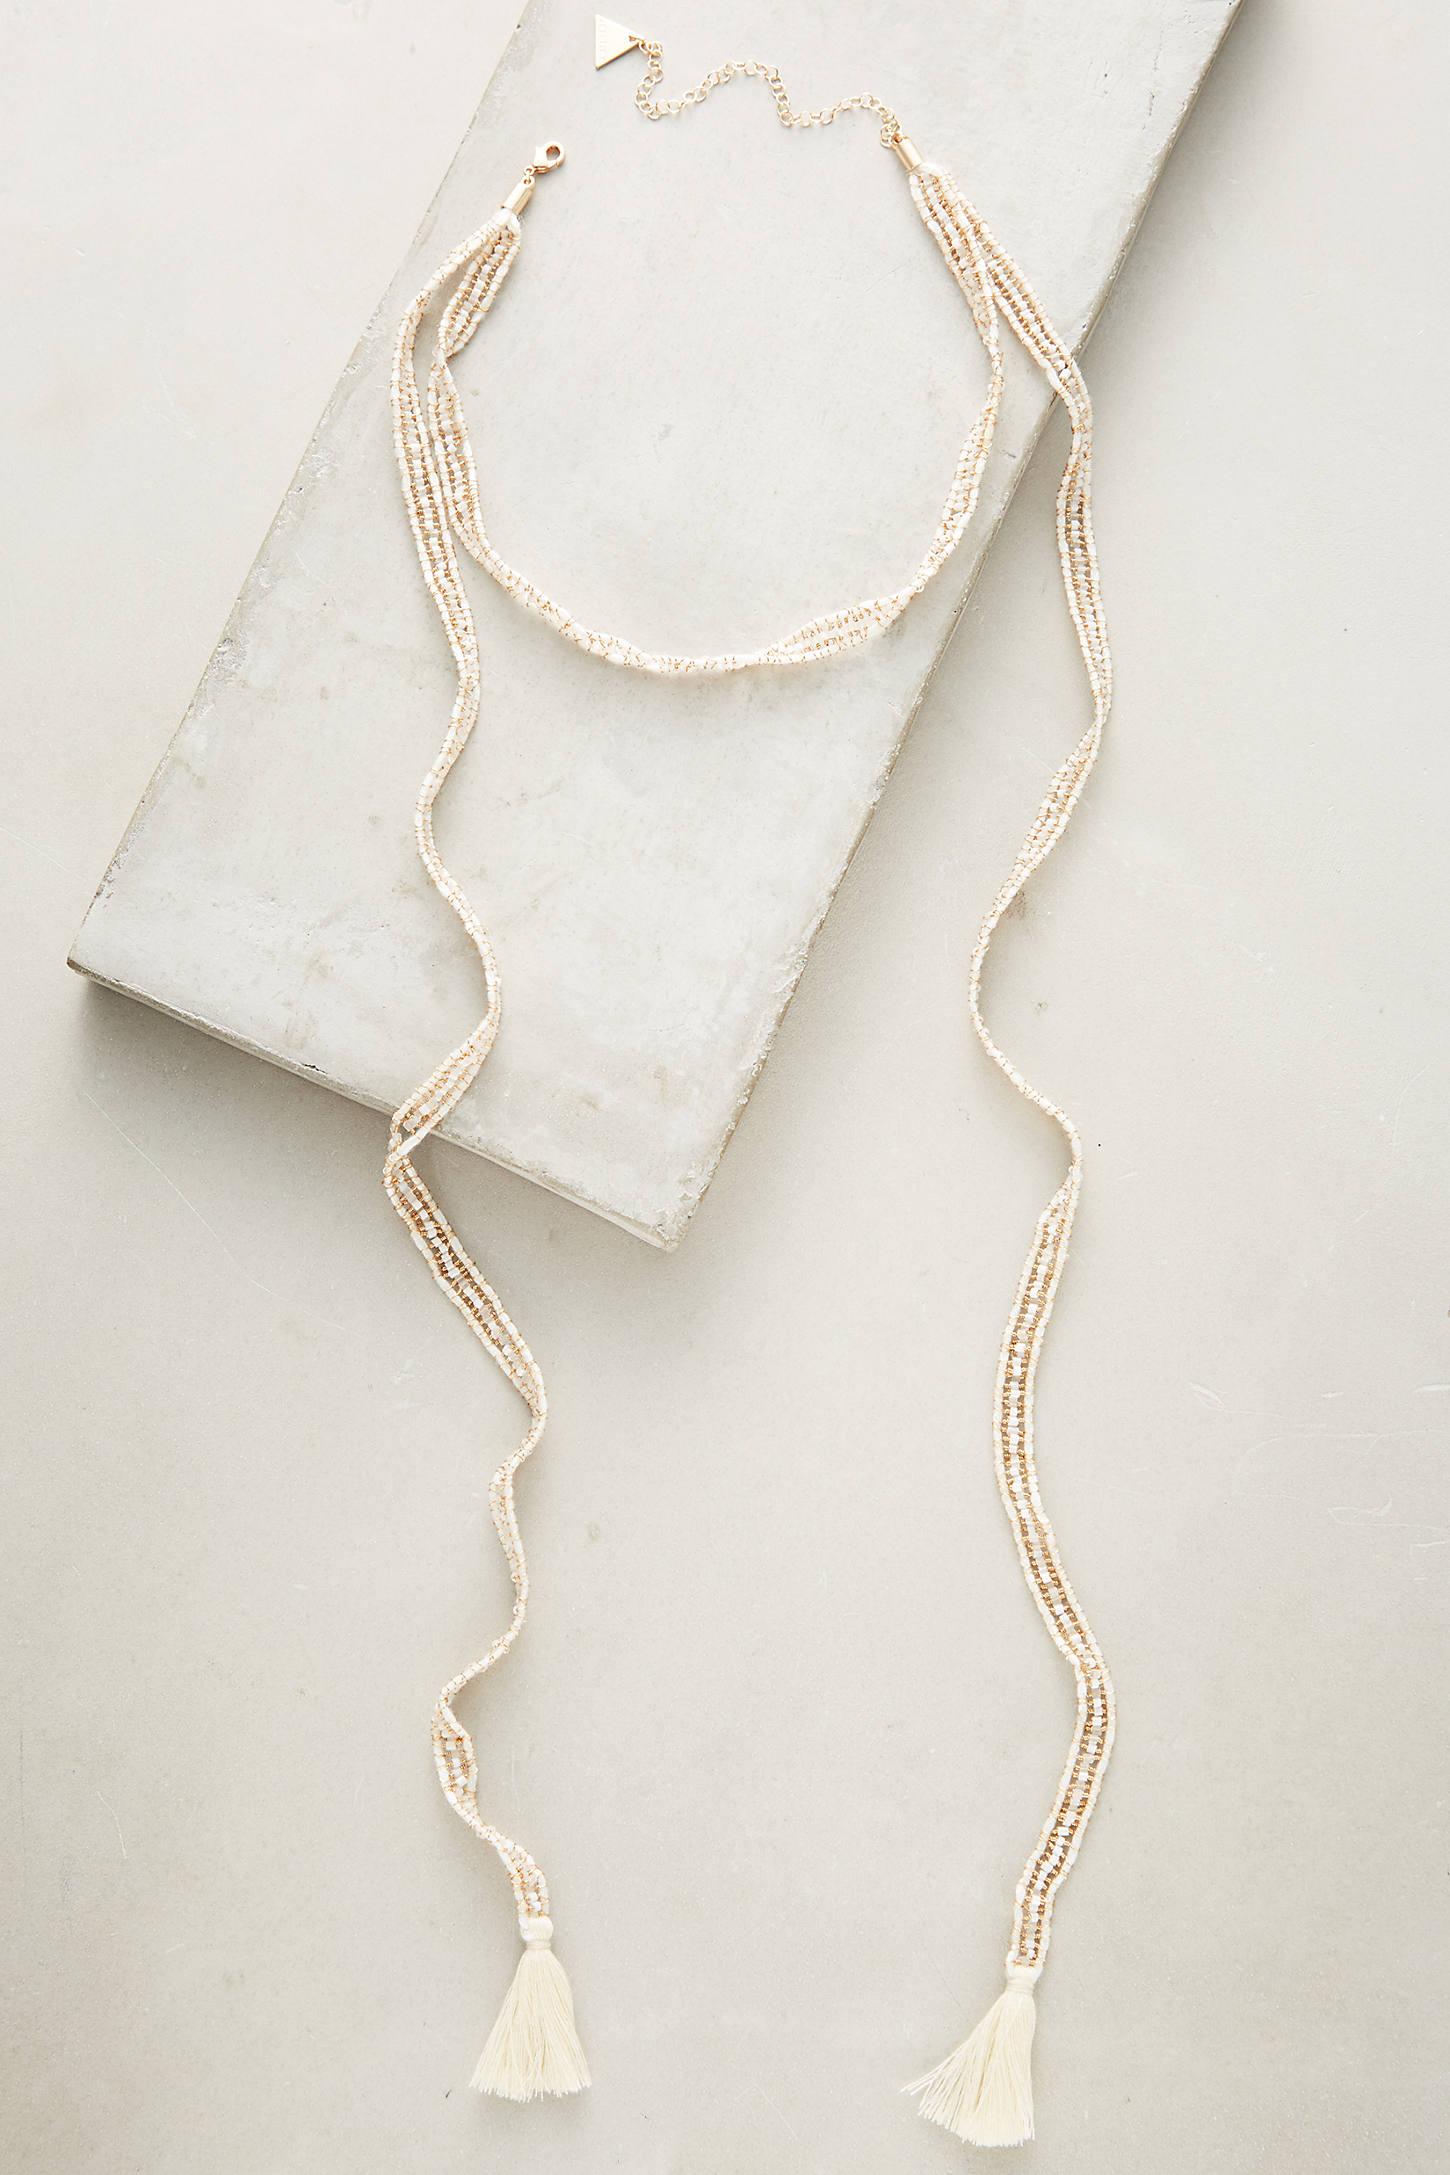 Tasseled Choker Wrap Necklace